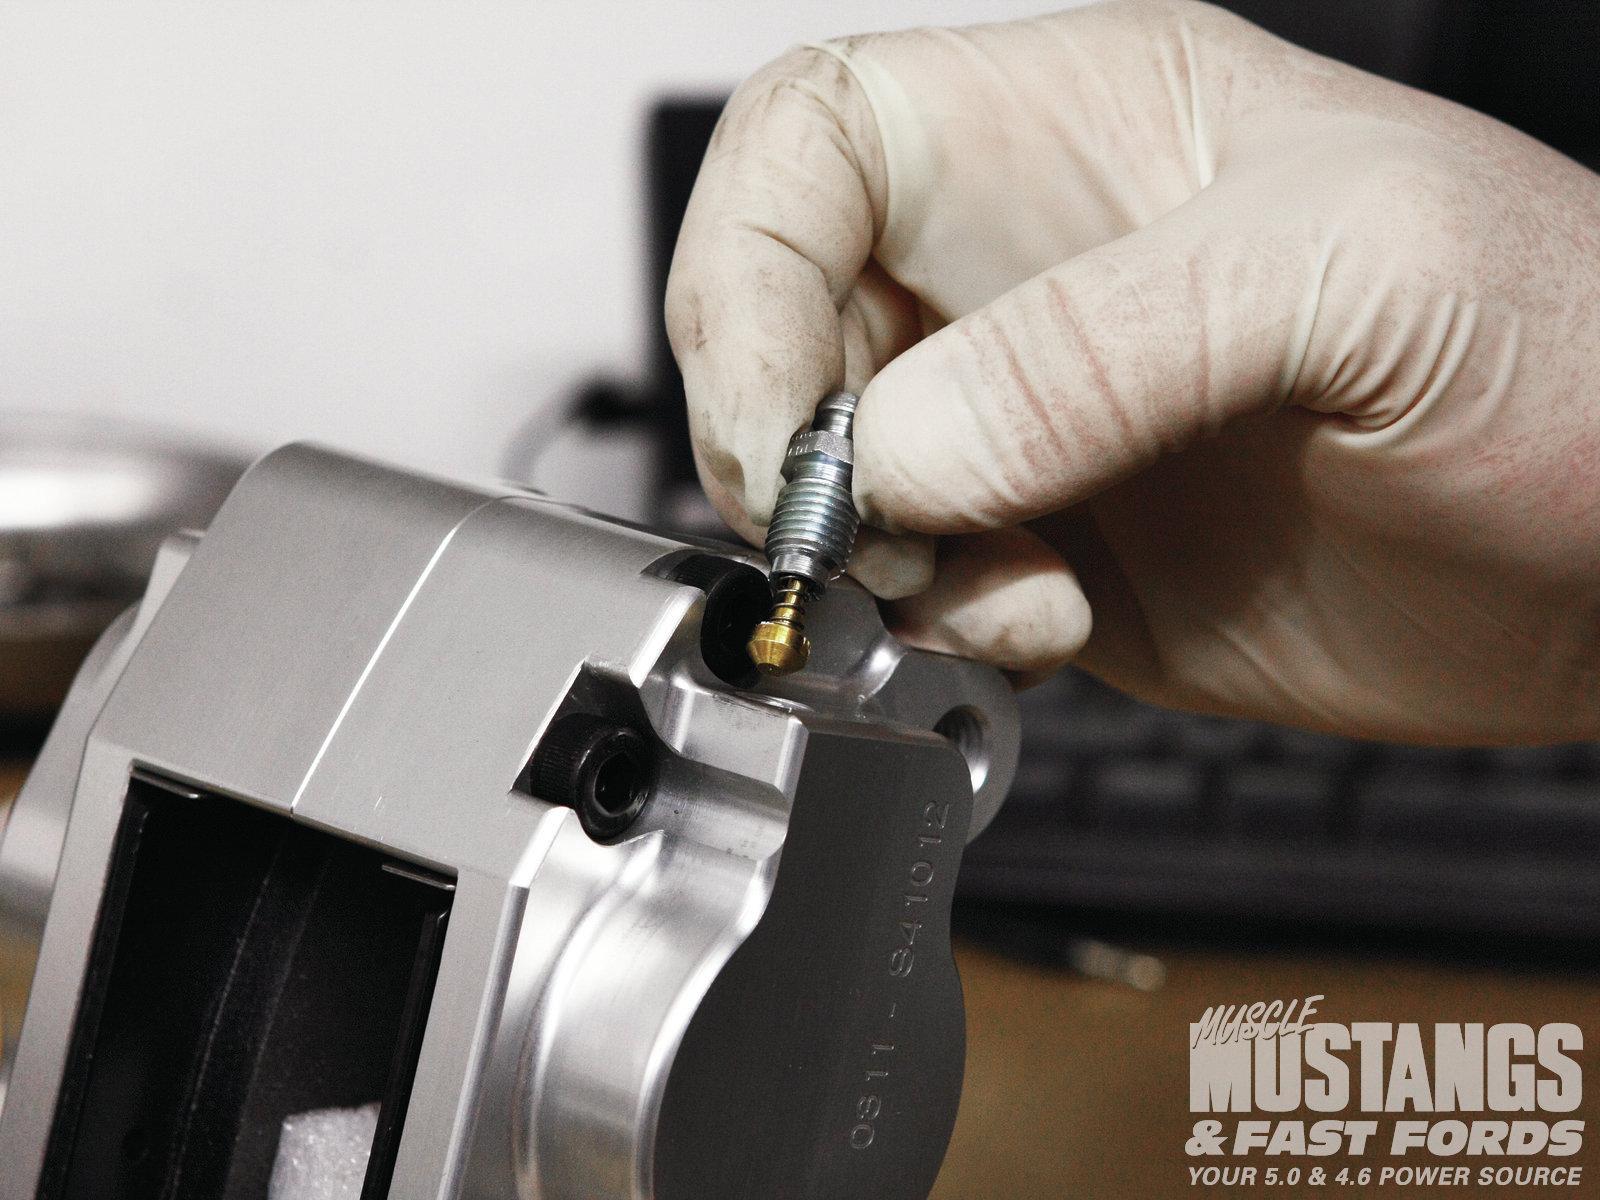 Mmfp 1110 Tech Ss4 Drag Spec Braking System Draggin The Brakes 015